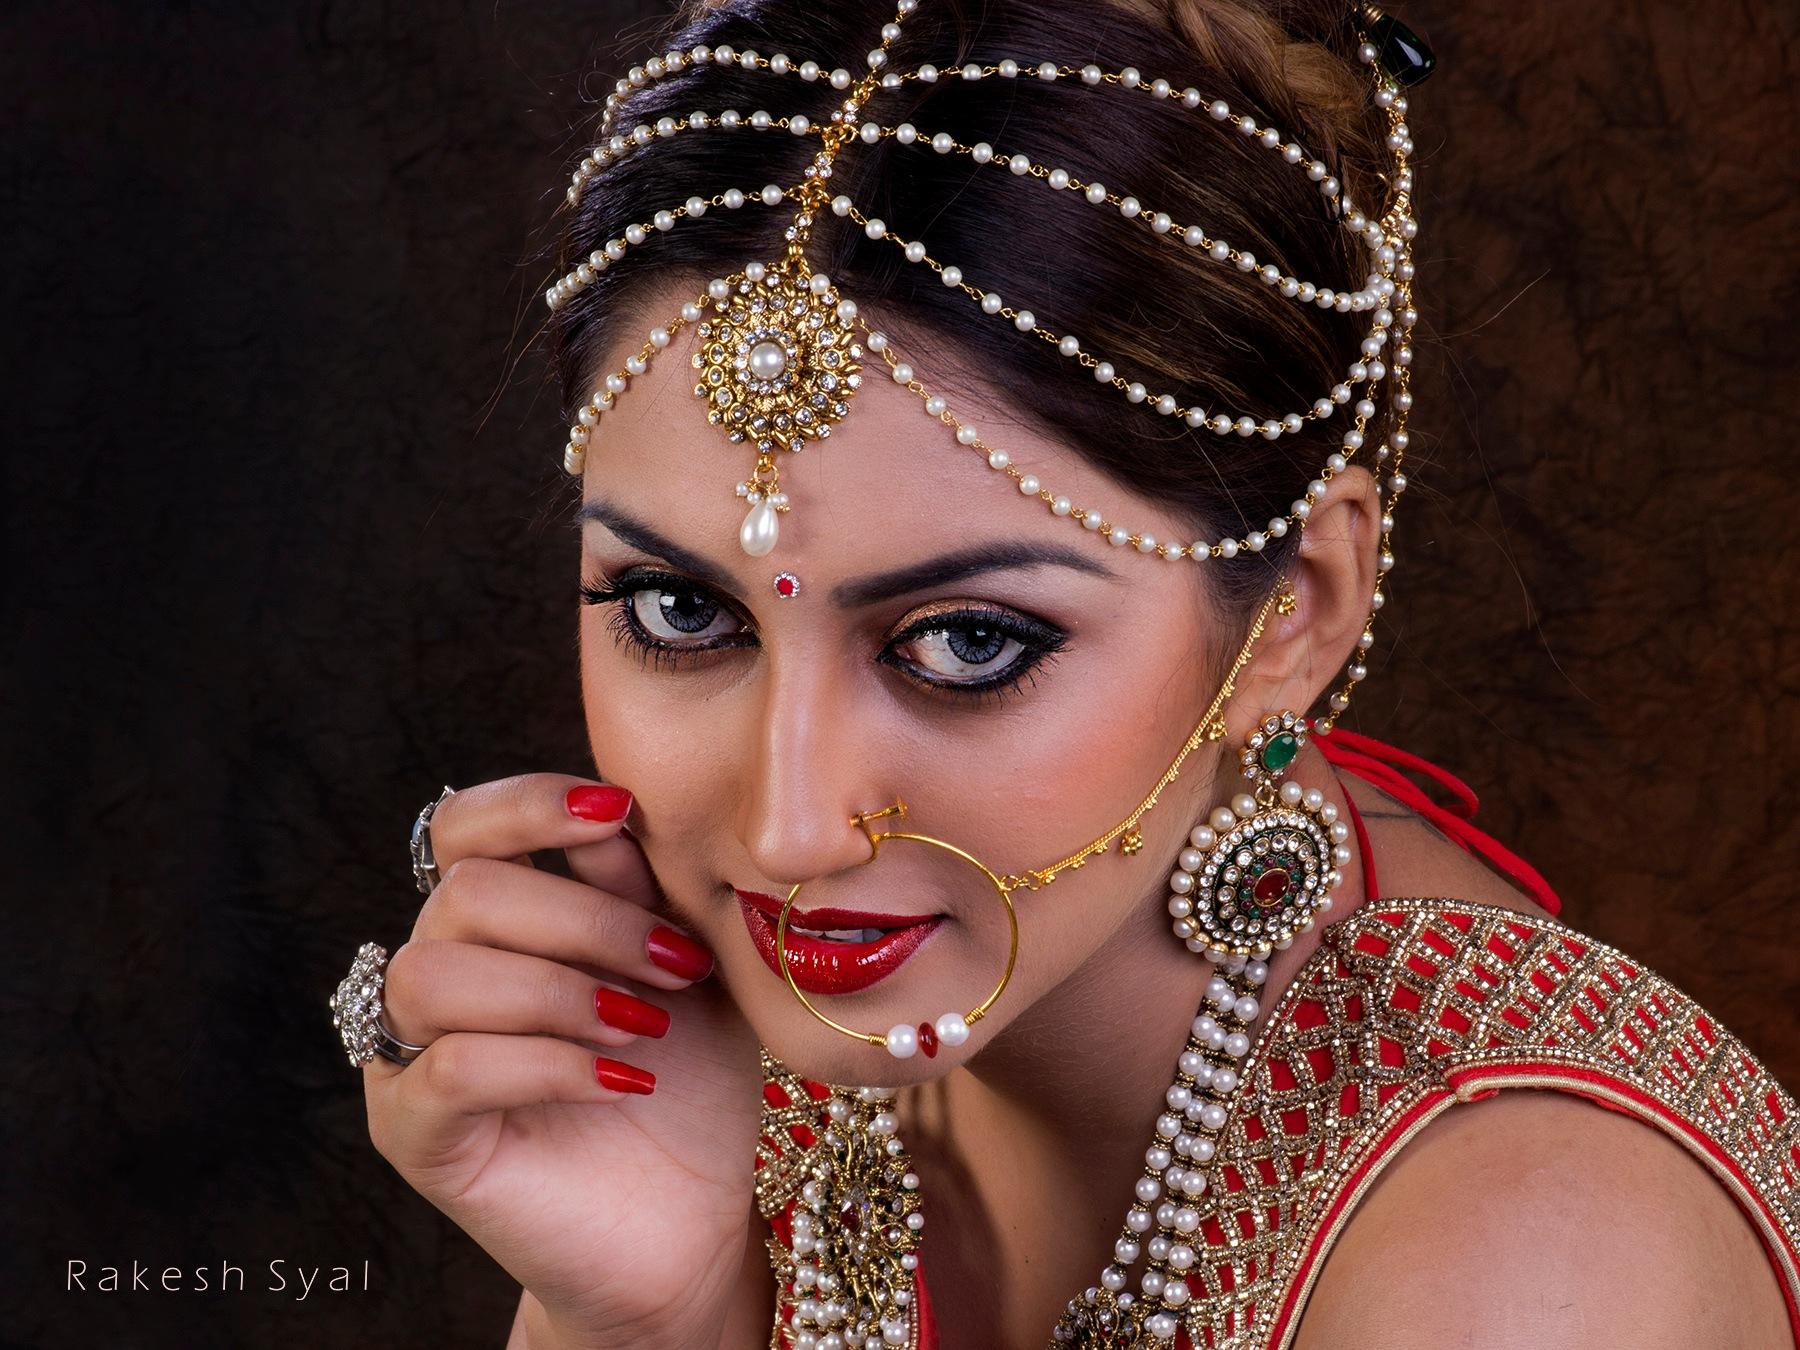 A BRIDAL PORTRAIT by Rakesh Syal